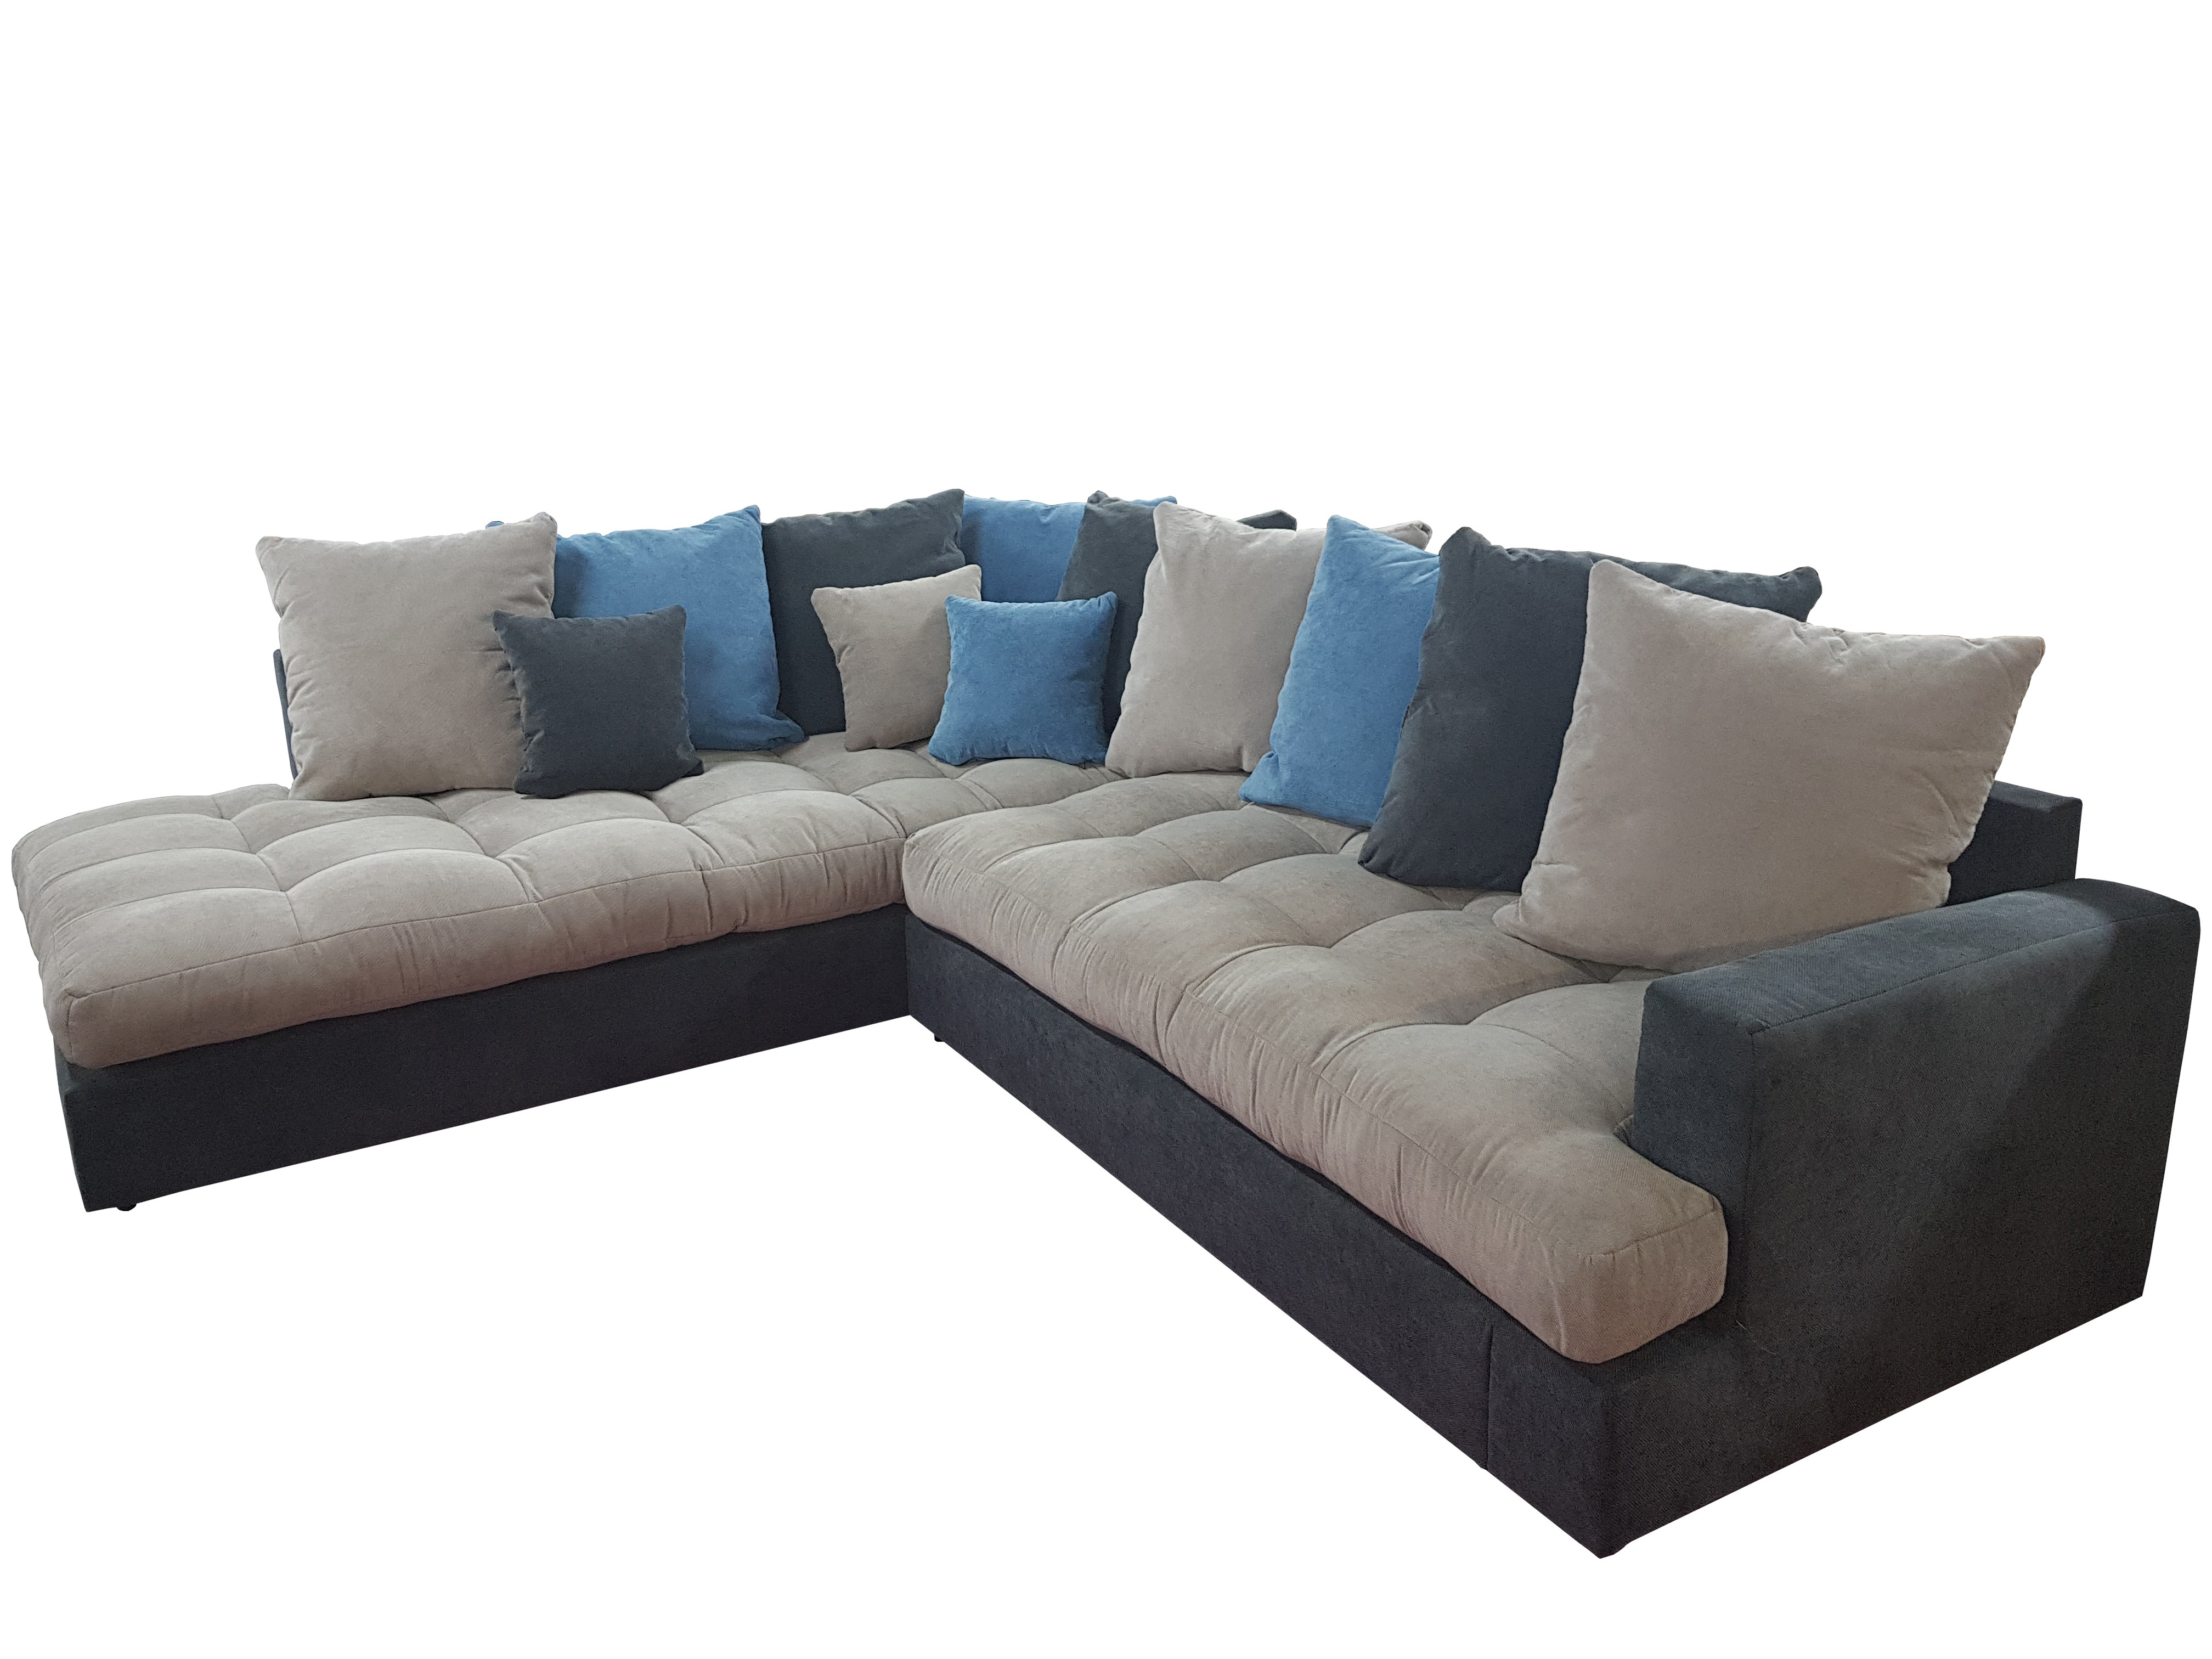 Canape d'angle laura